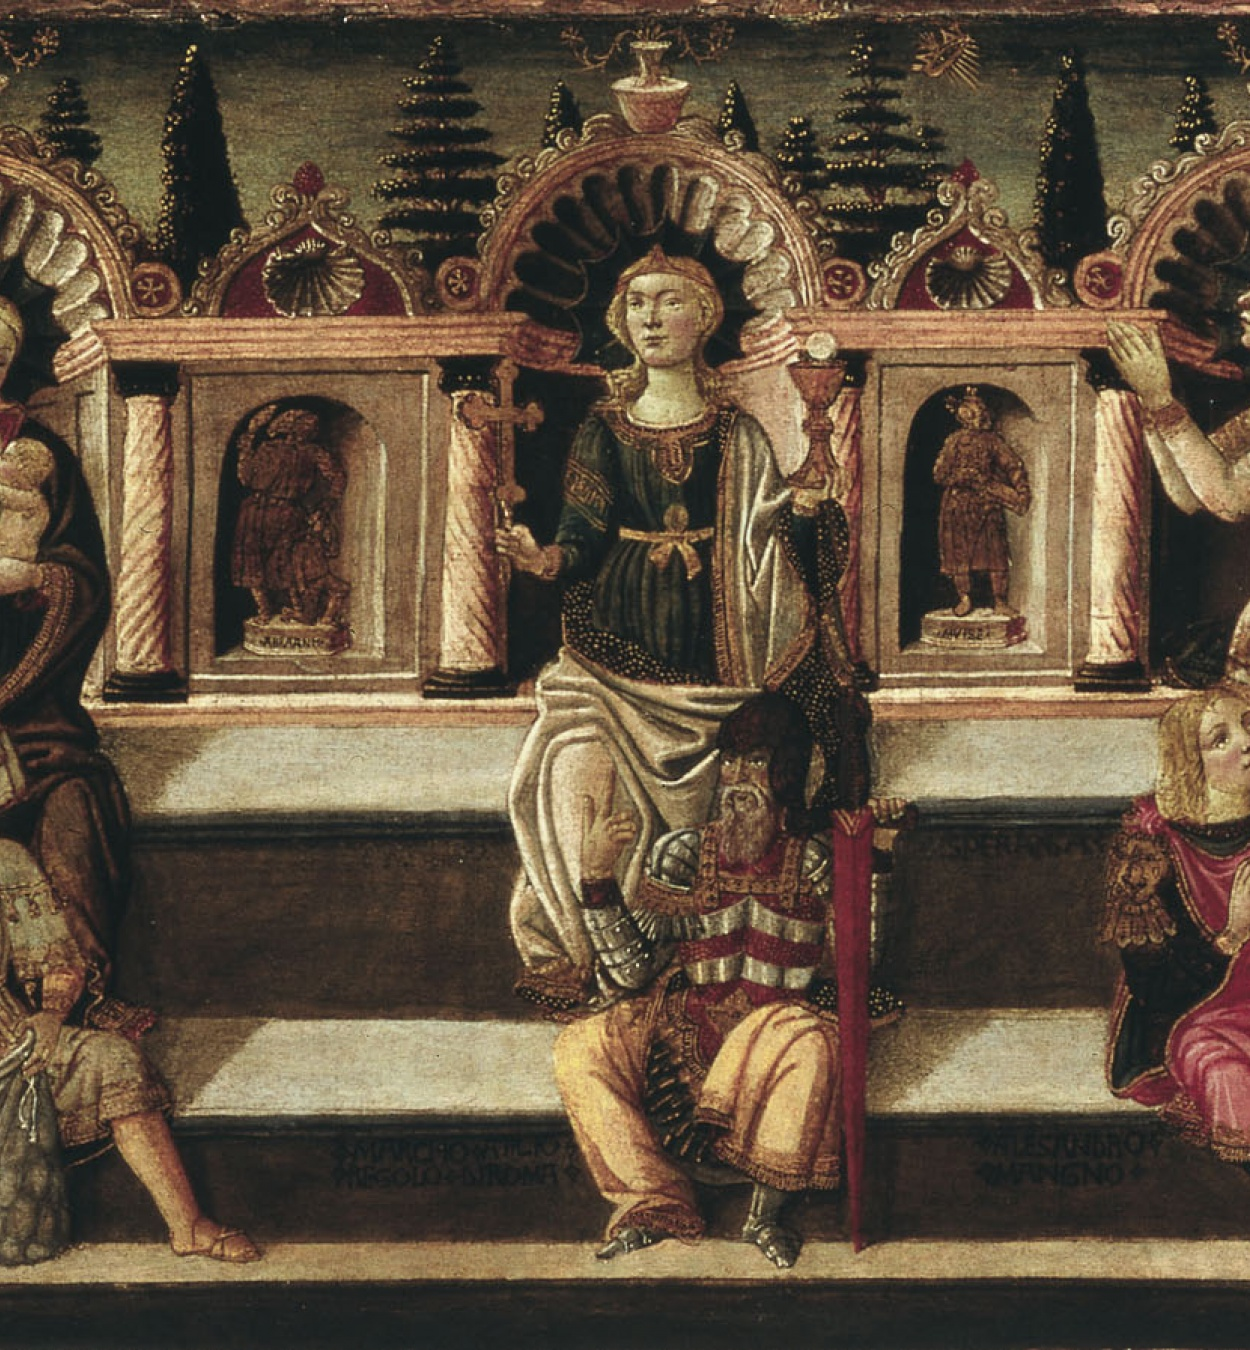 Anton Francesco dello Scheggia - Les set Virtuts - 1465-1470